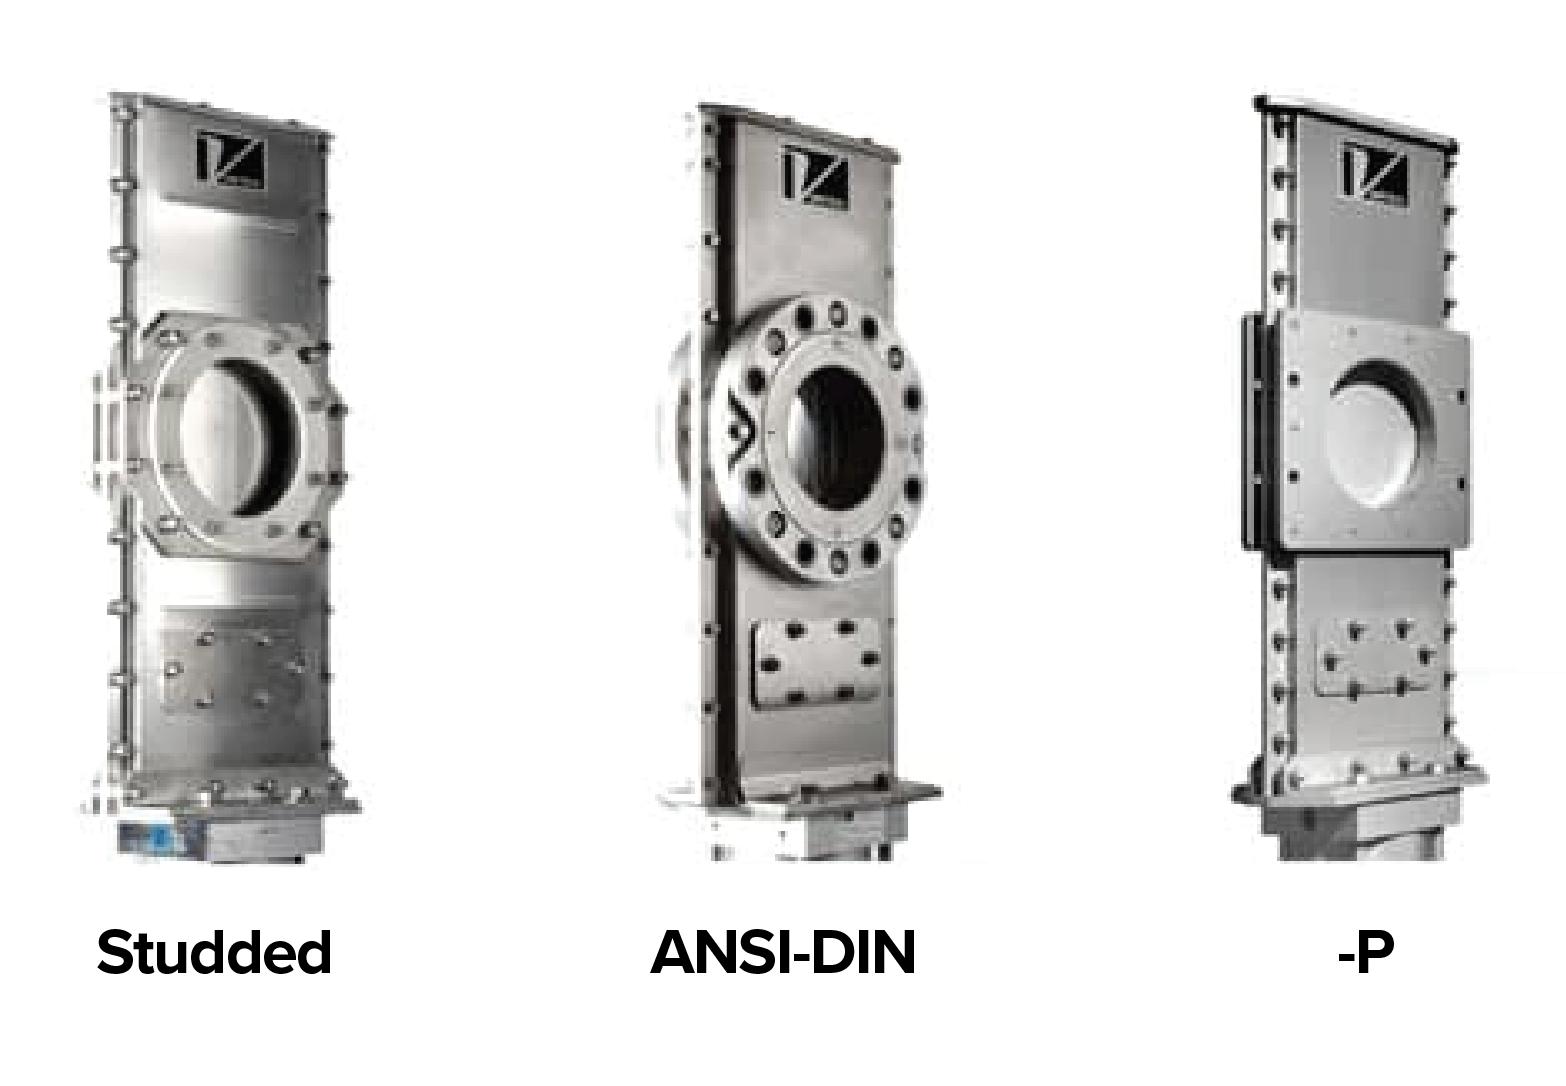 Three options for a Vortex Orifice Gate. 1. Studded, 2. ANSI-DIN, 3. -P